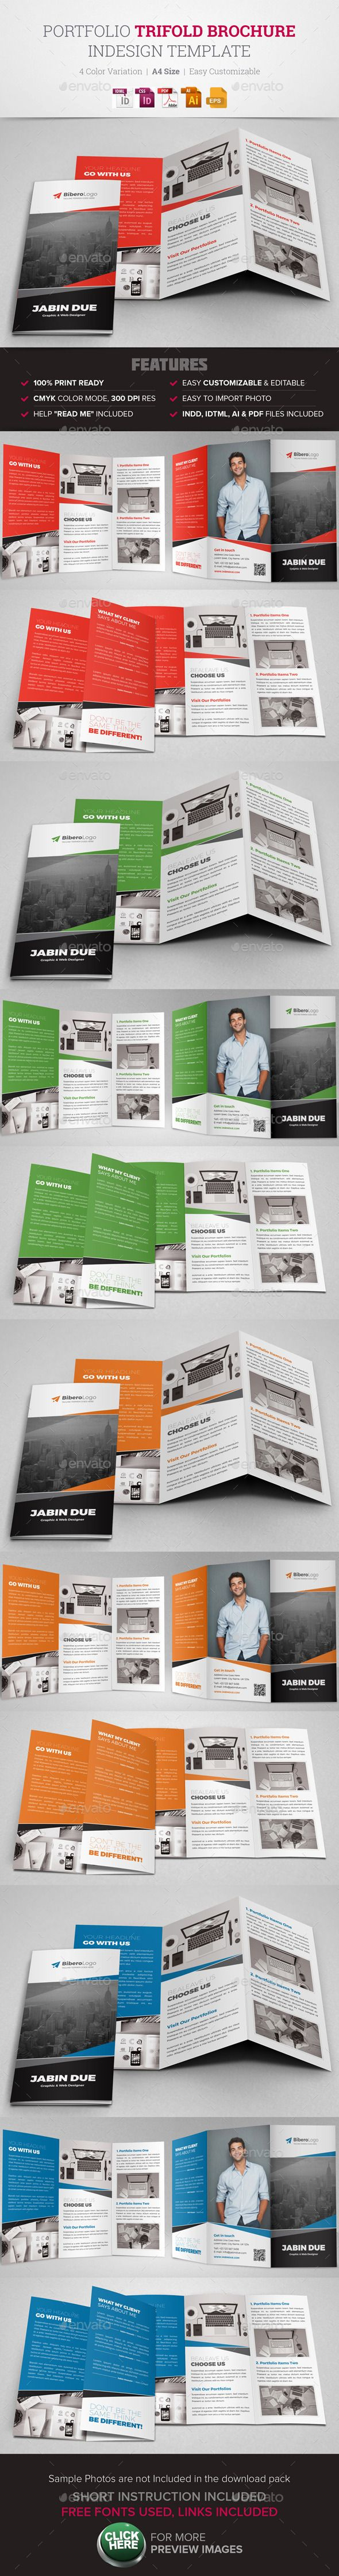 Portfolio Trifold Brochure Indesign Template | Folletos